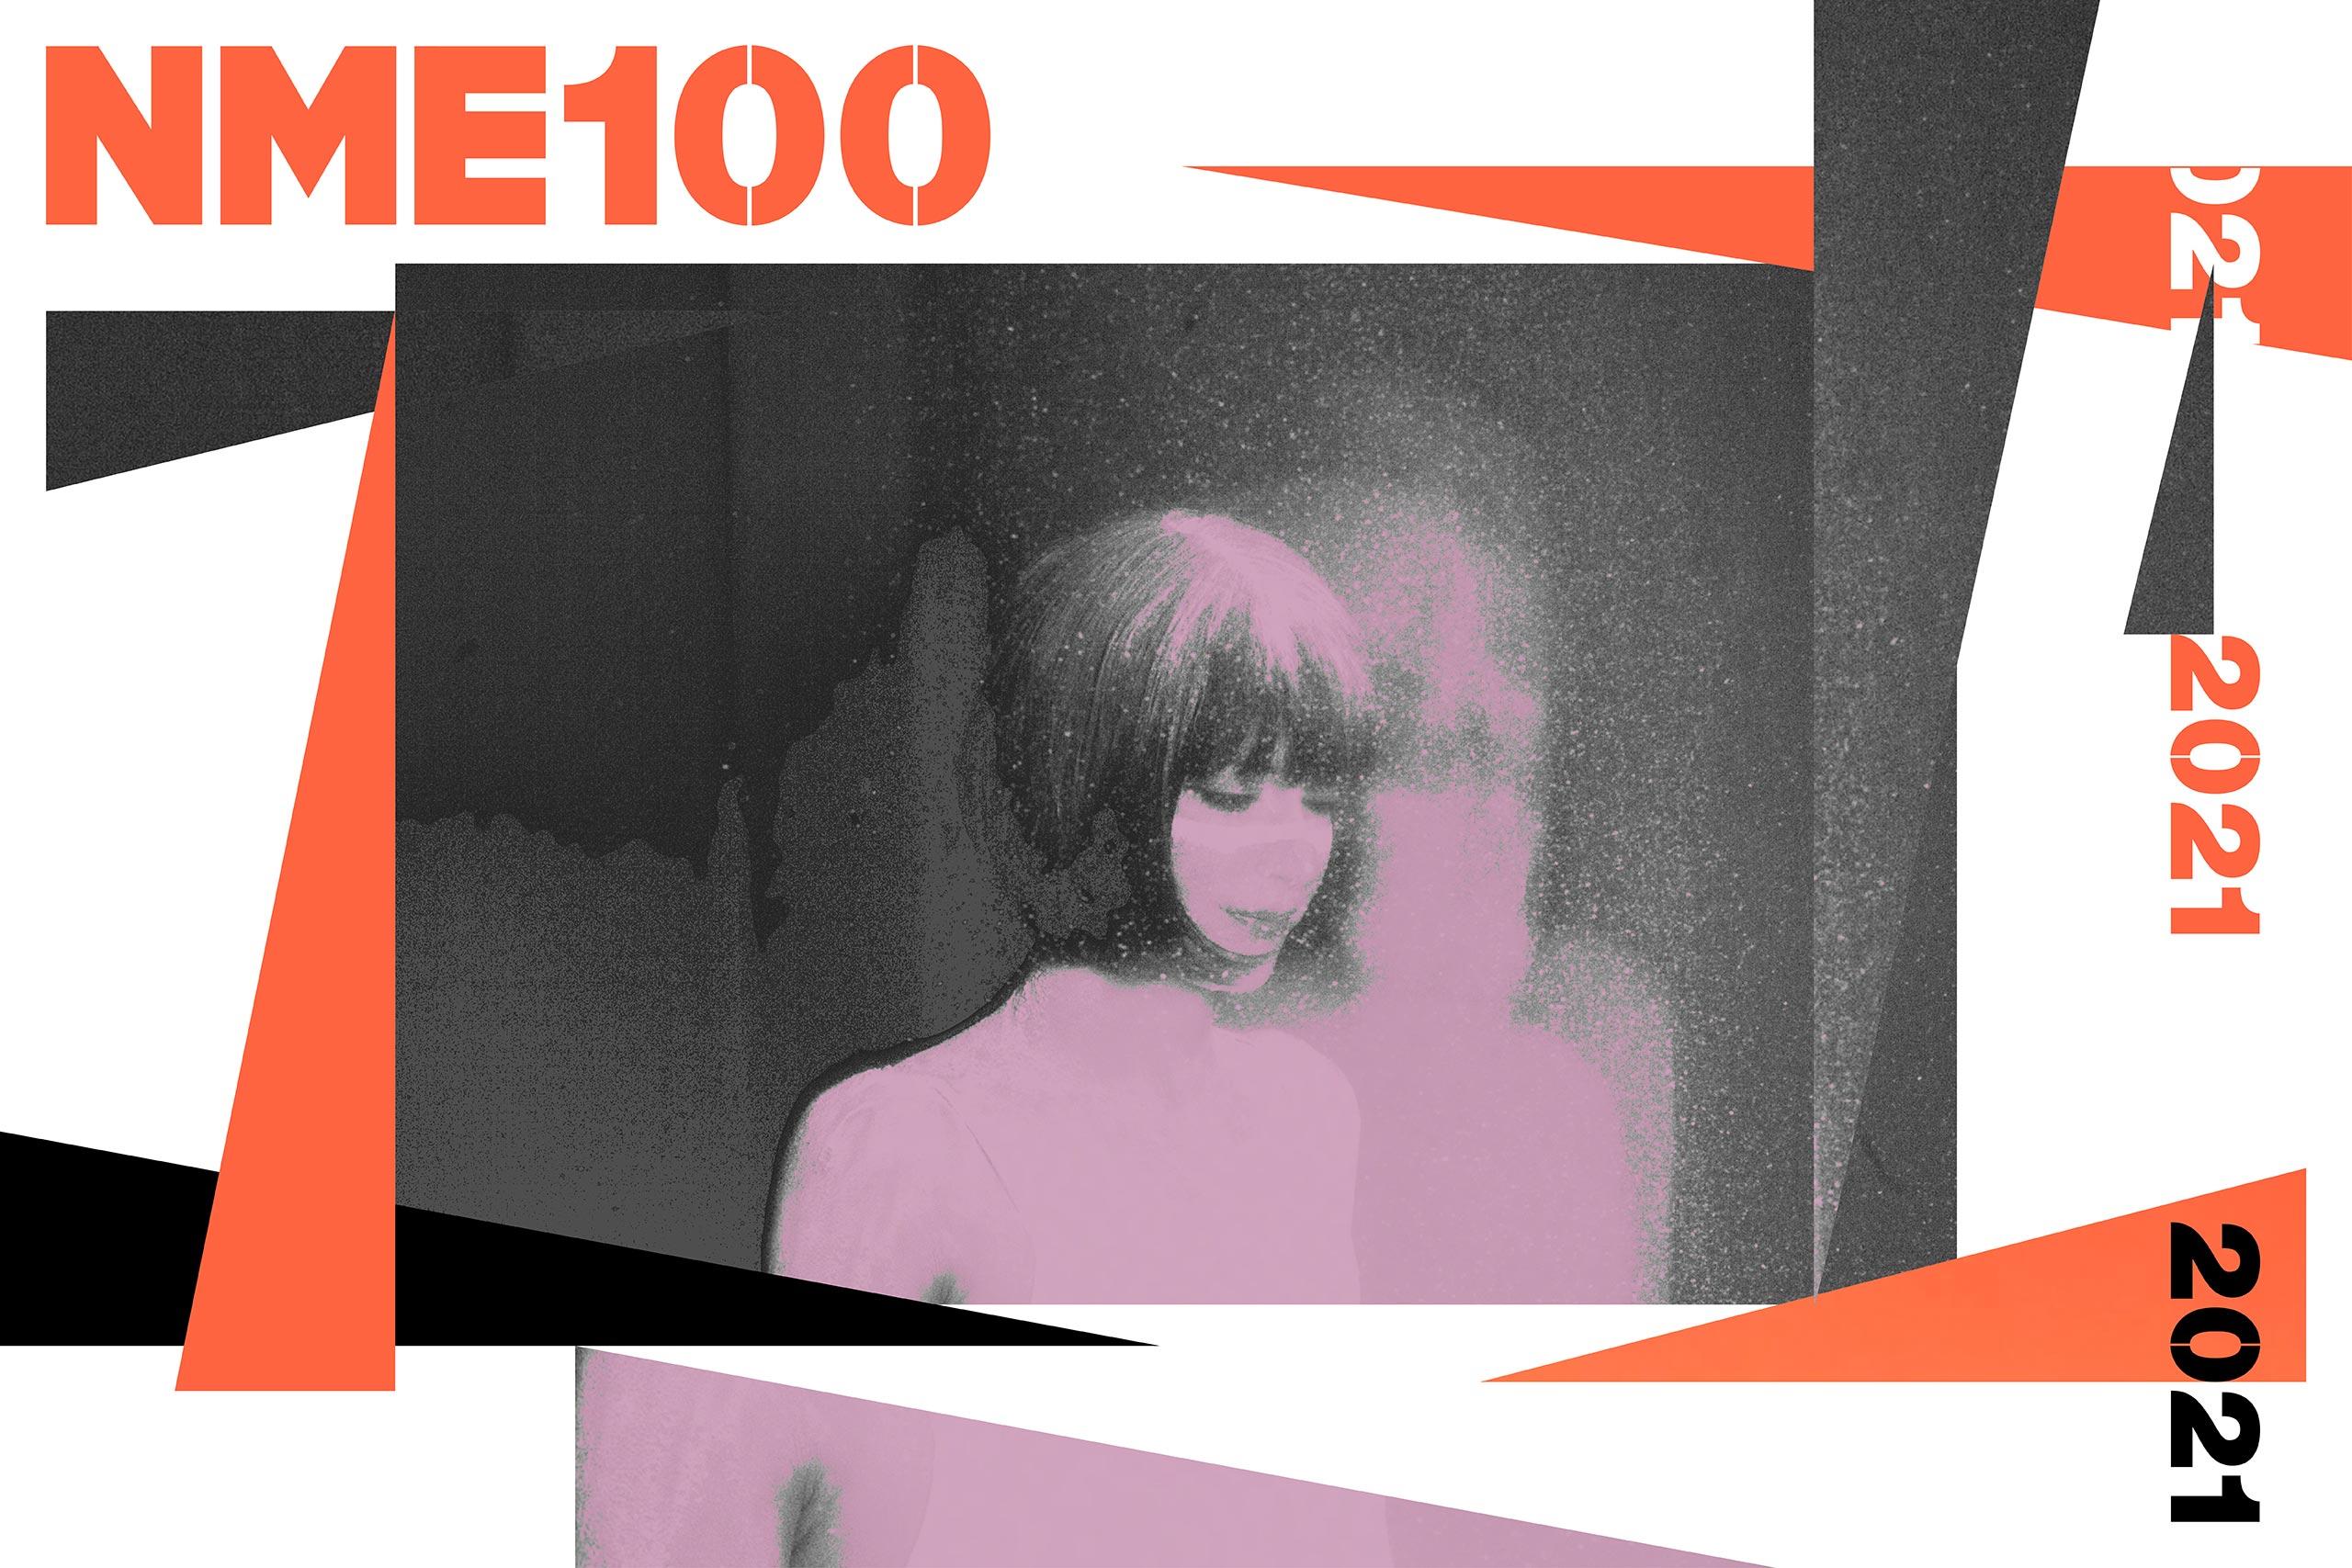 NME 100 isola